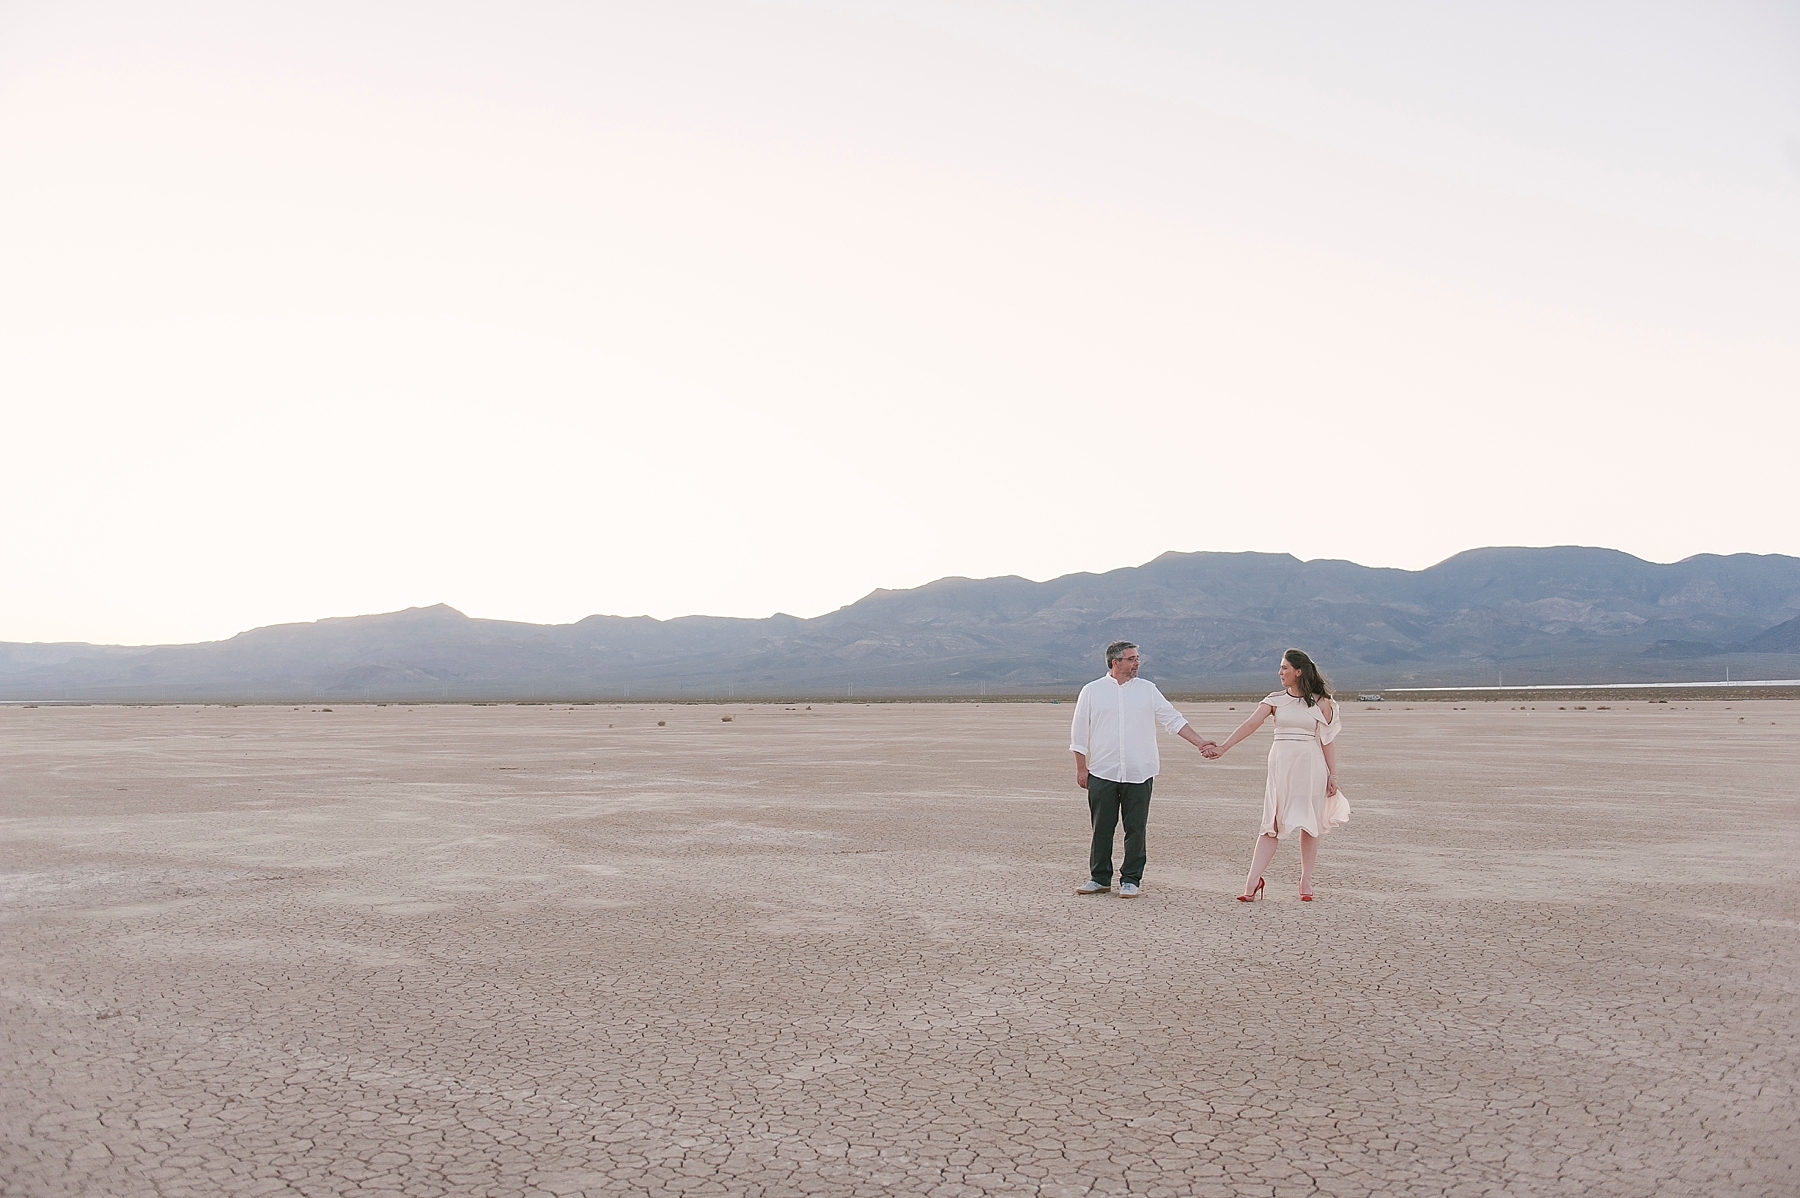 Las_vegas_desert_dry_lake_bed_elopement-1-2.jpg